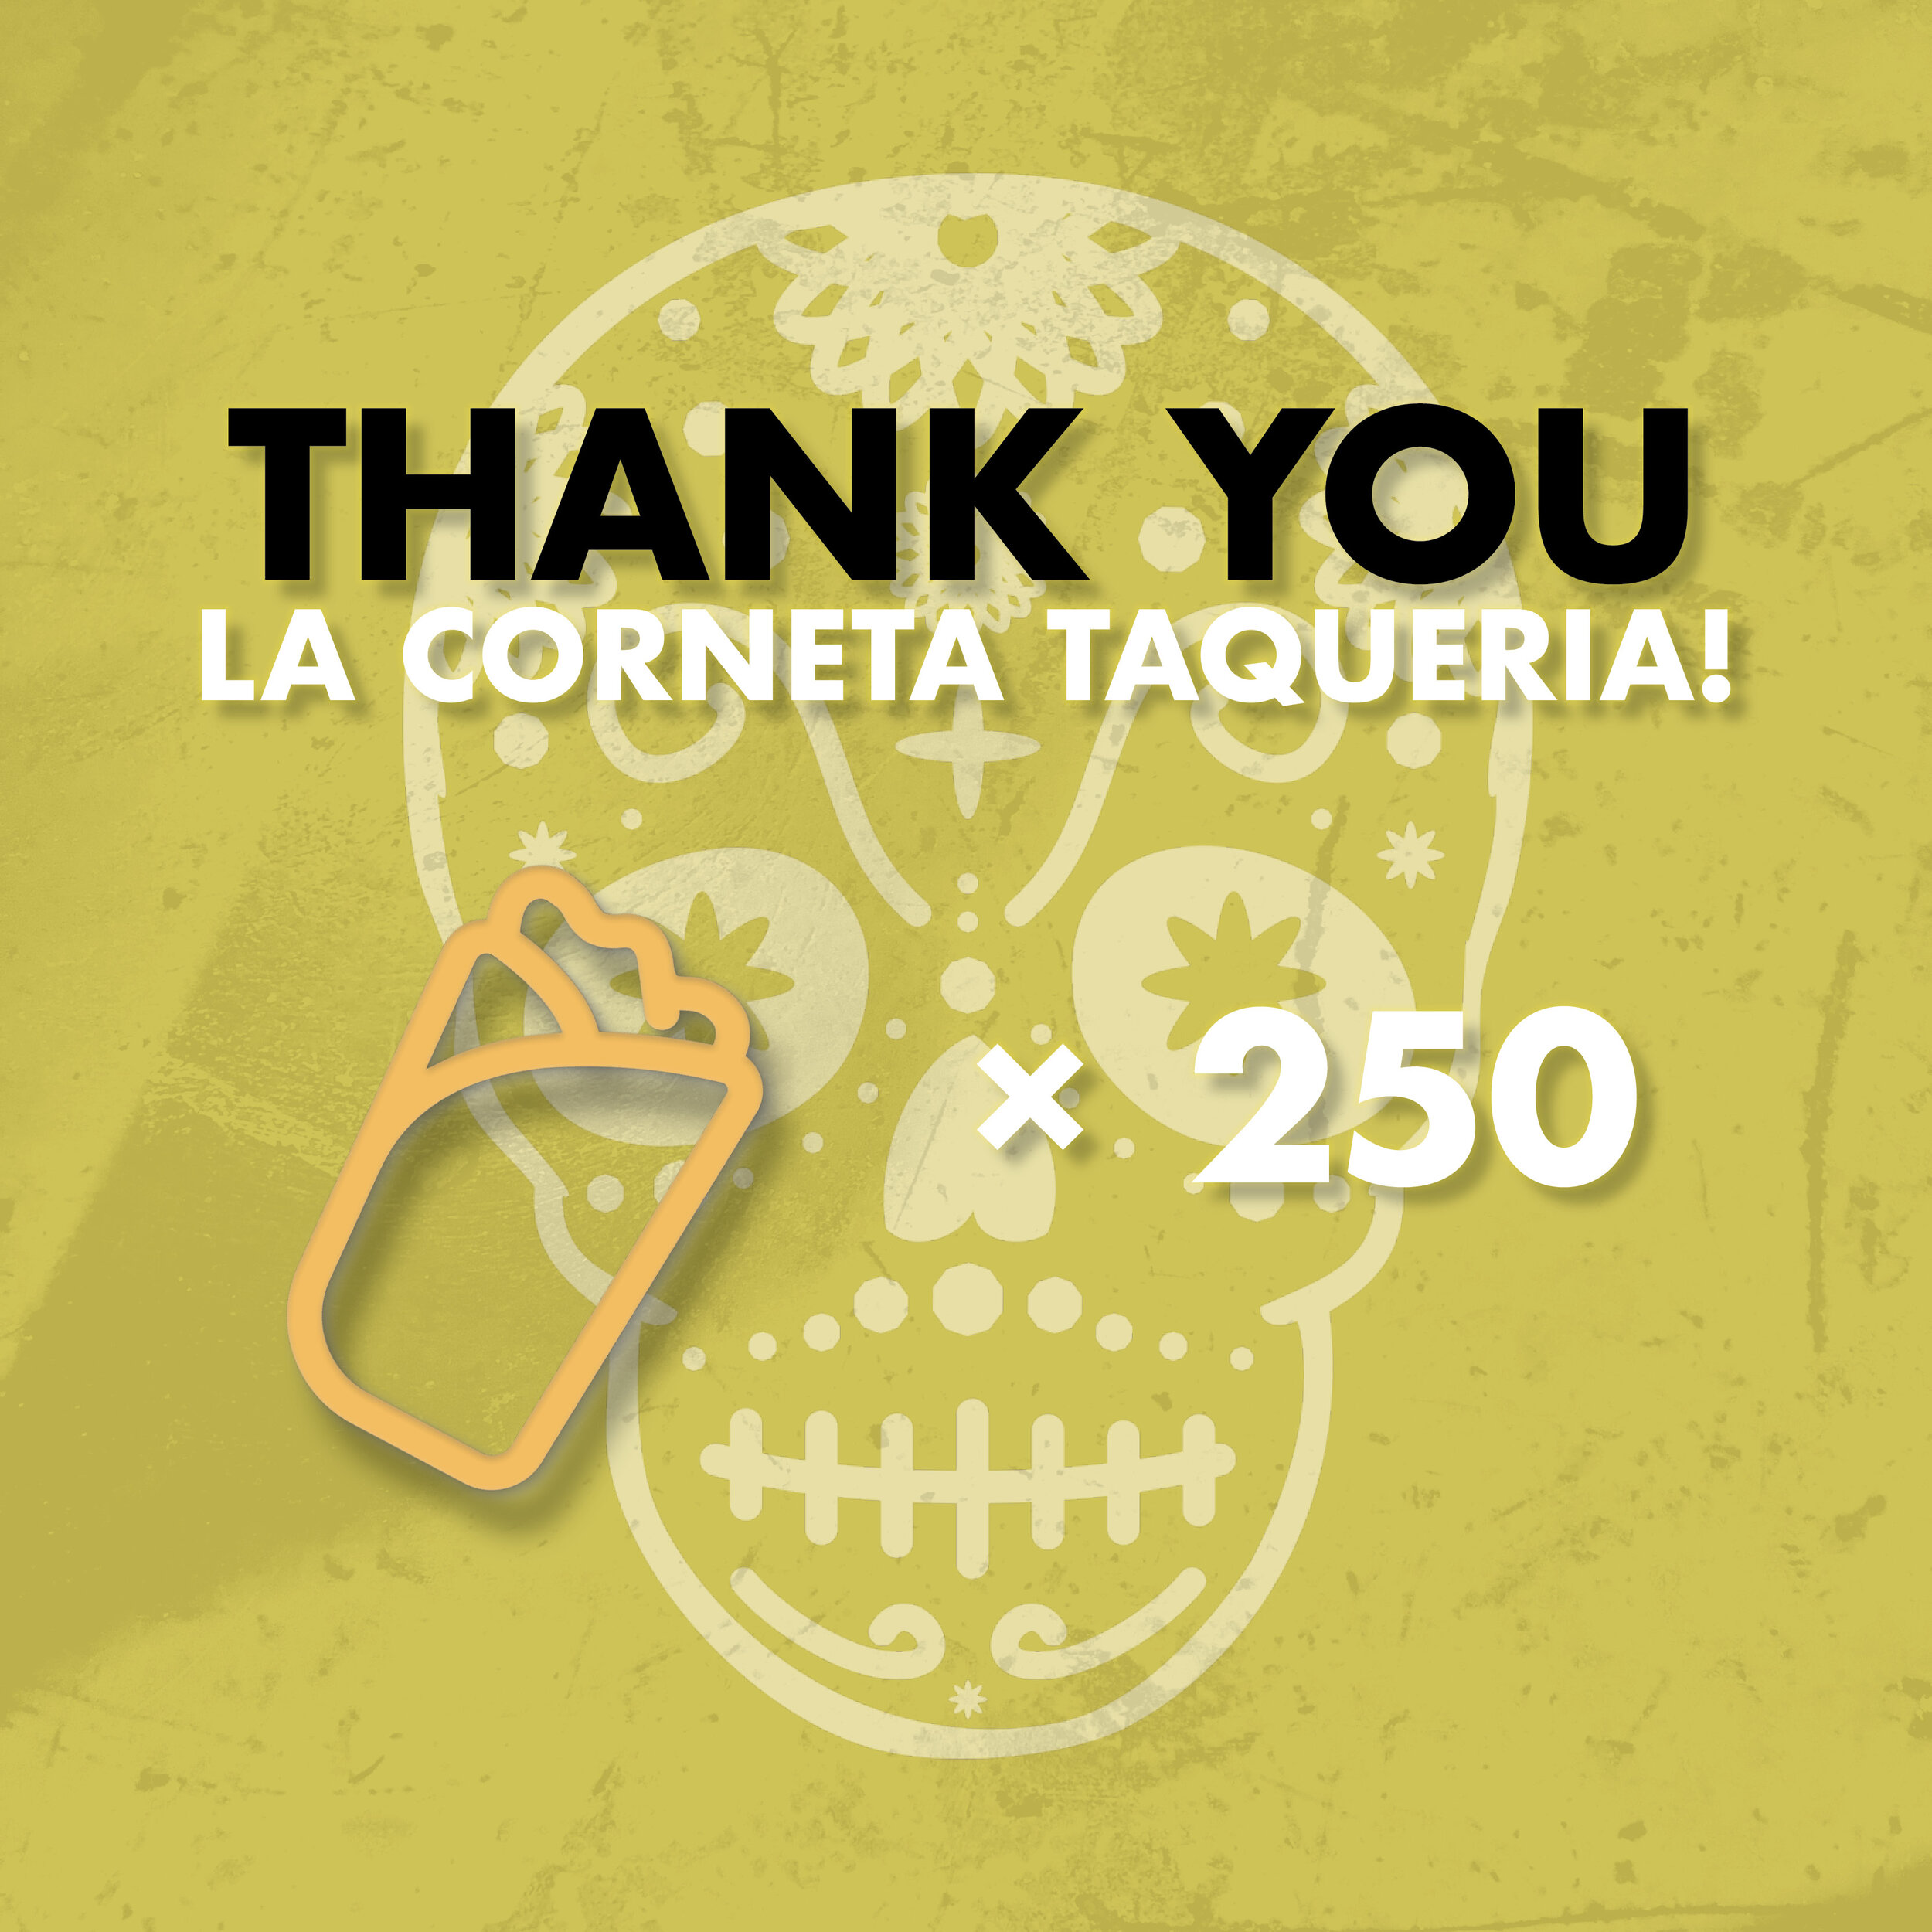 Thank you La Corneta Taqueria for the 250 Burritos!